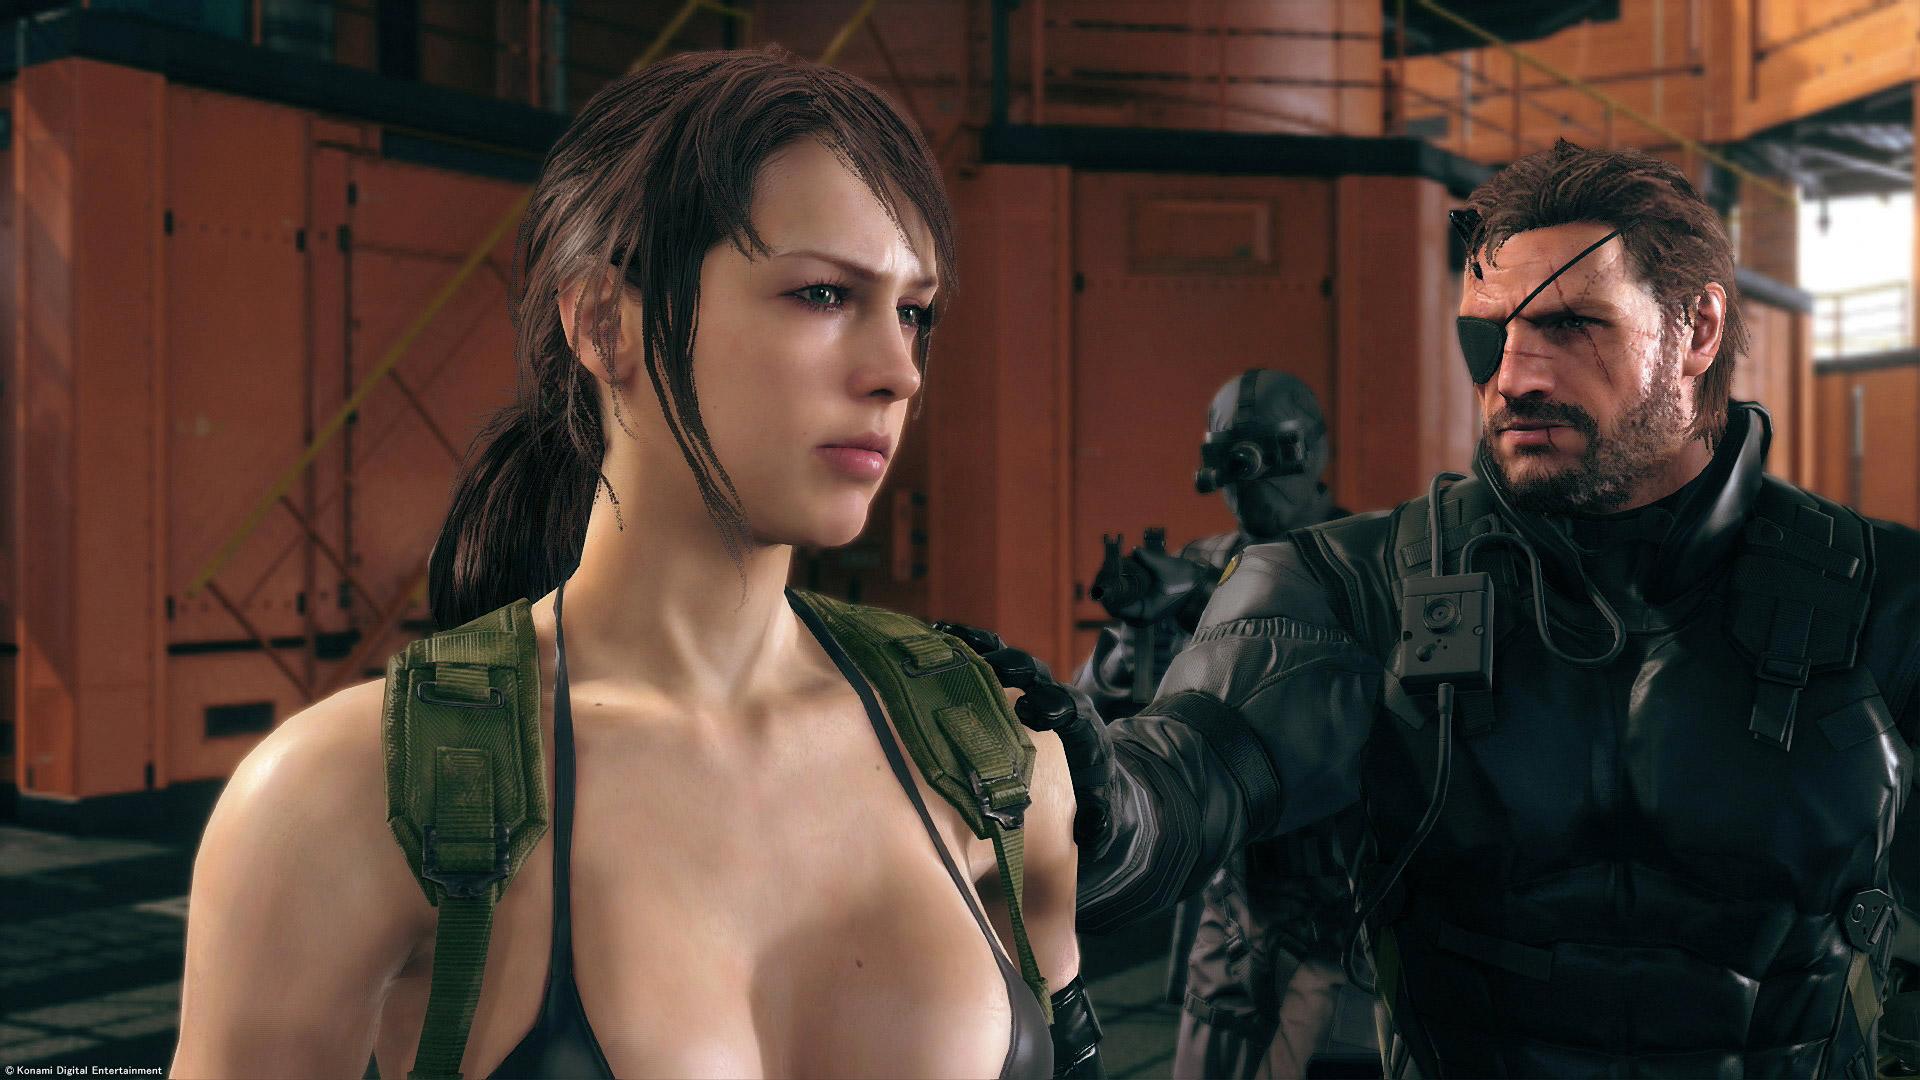 Konami explains workaround for Metal Gear Solid 5 save bug